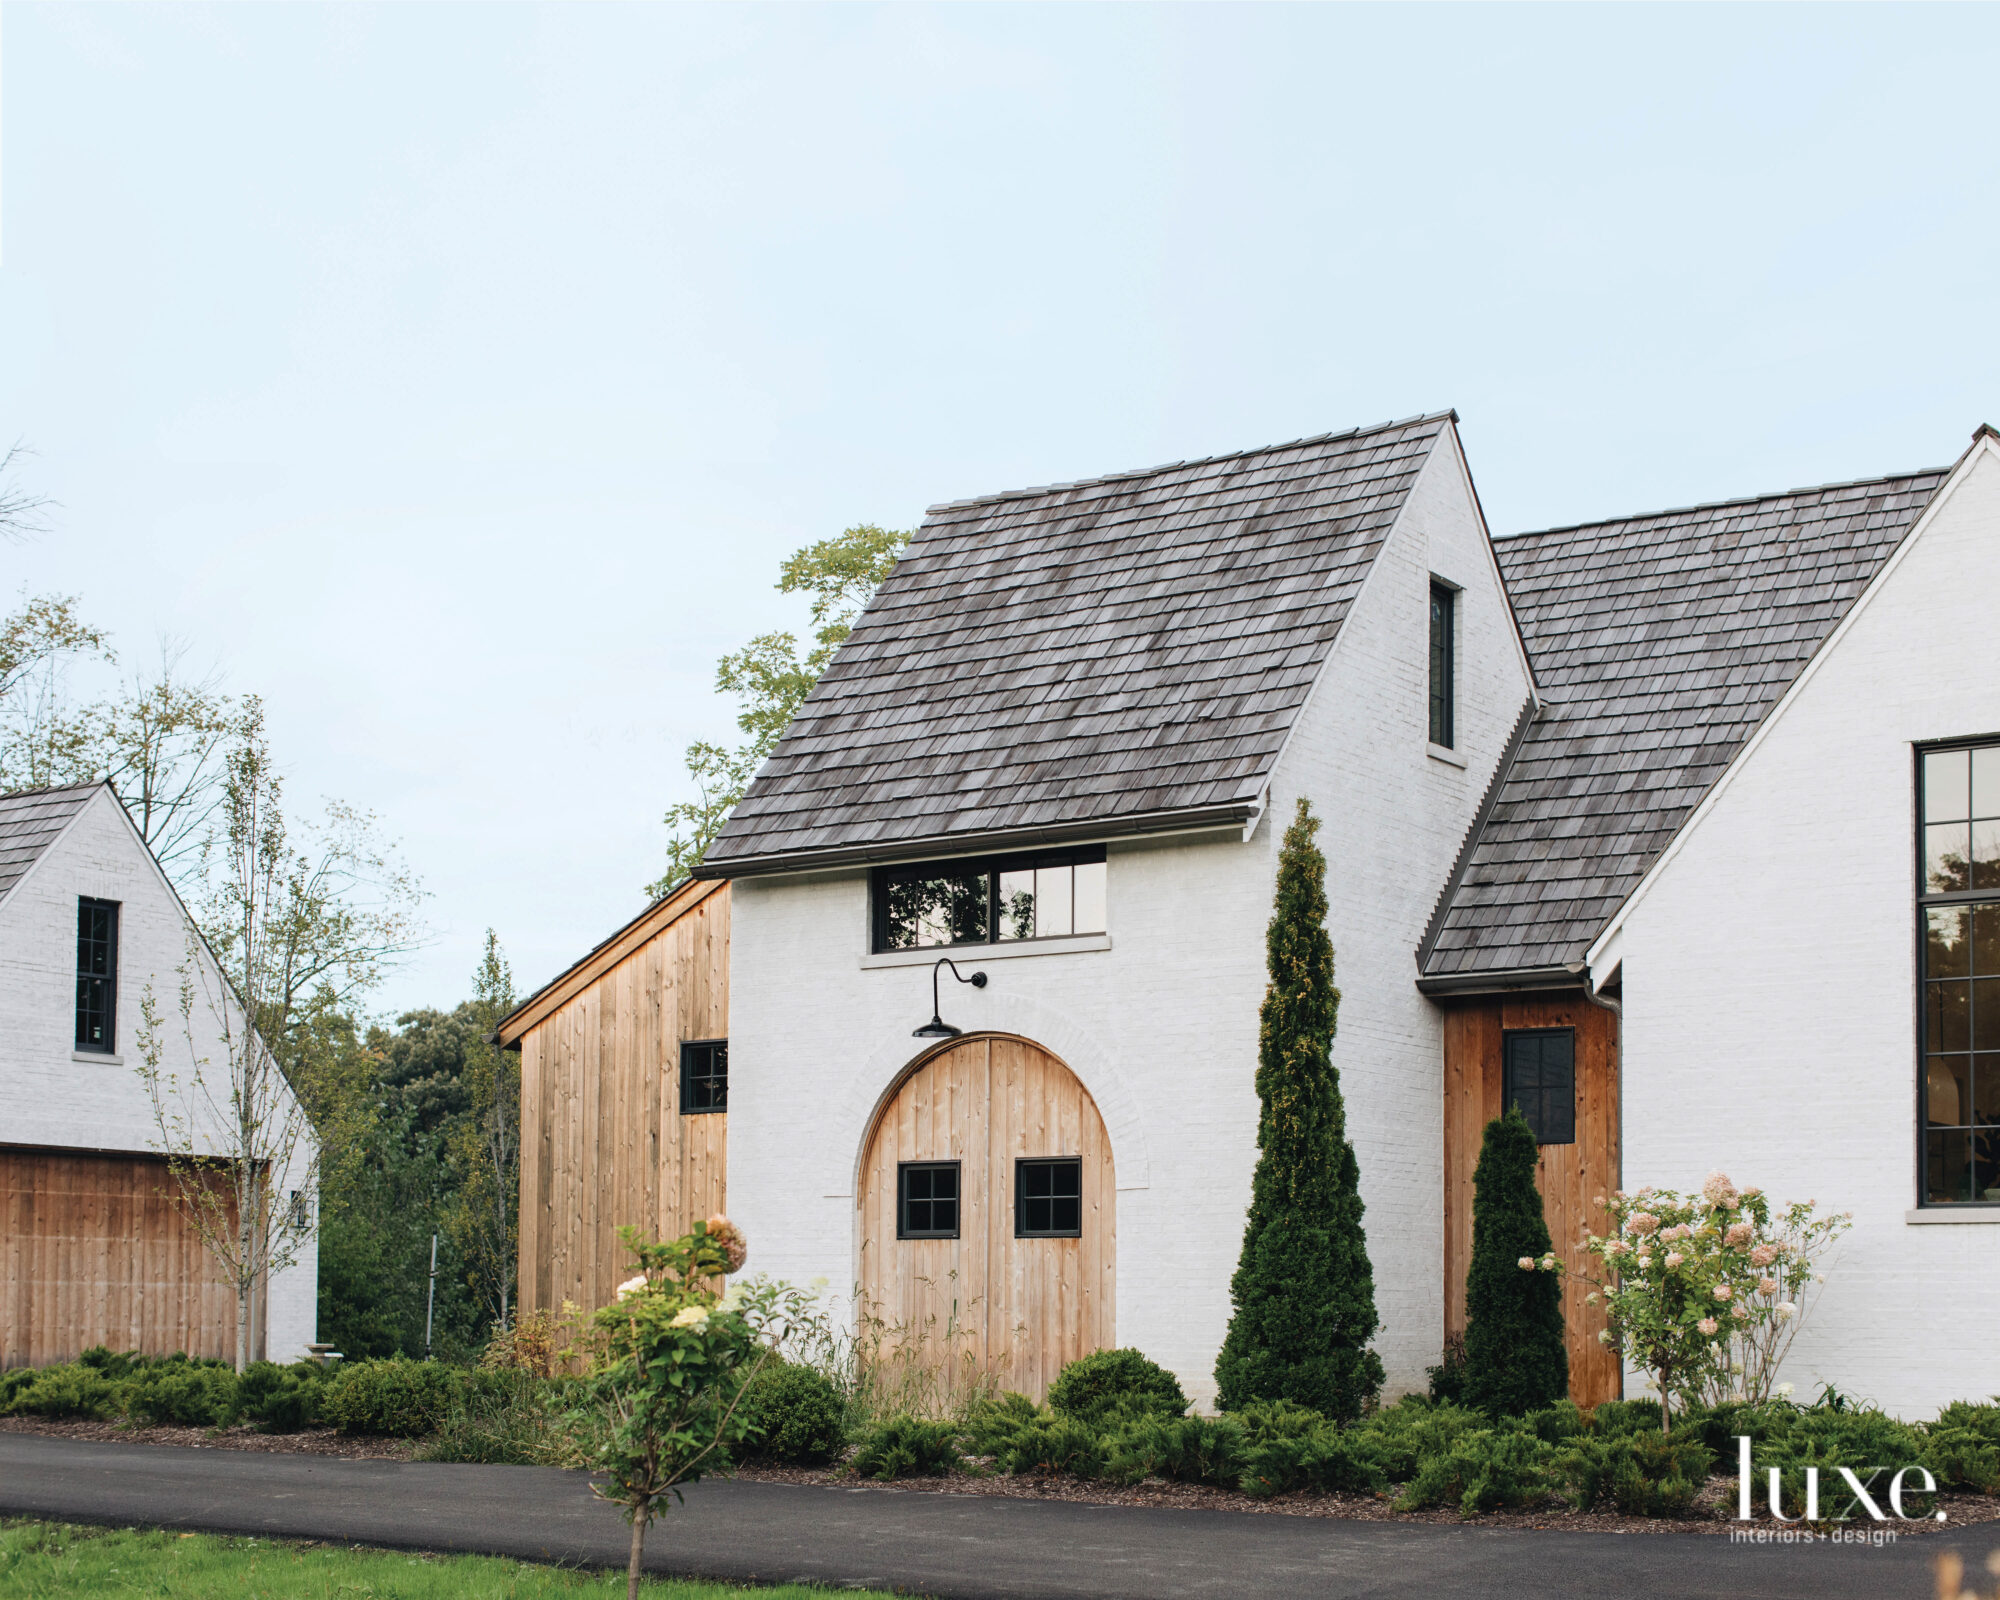 European farmhouse vibes radiate out...